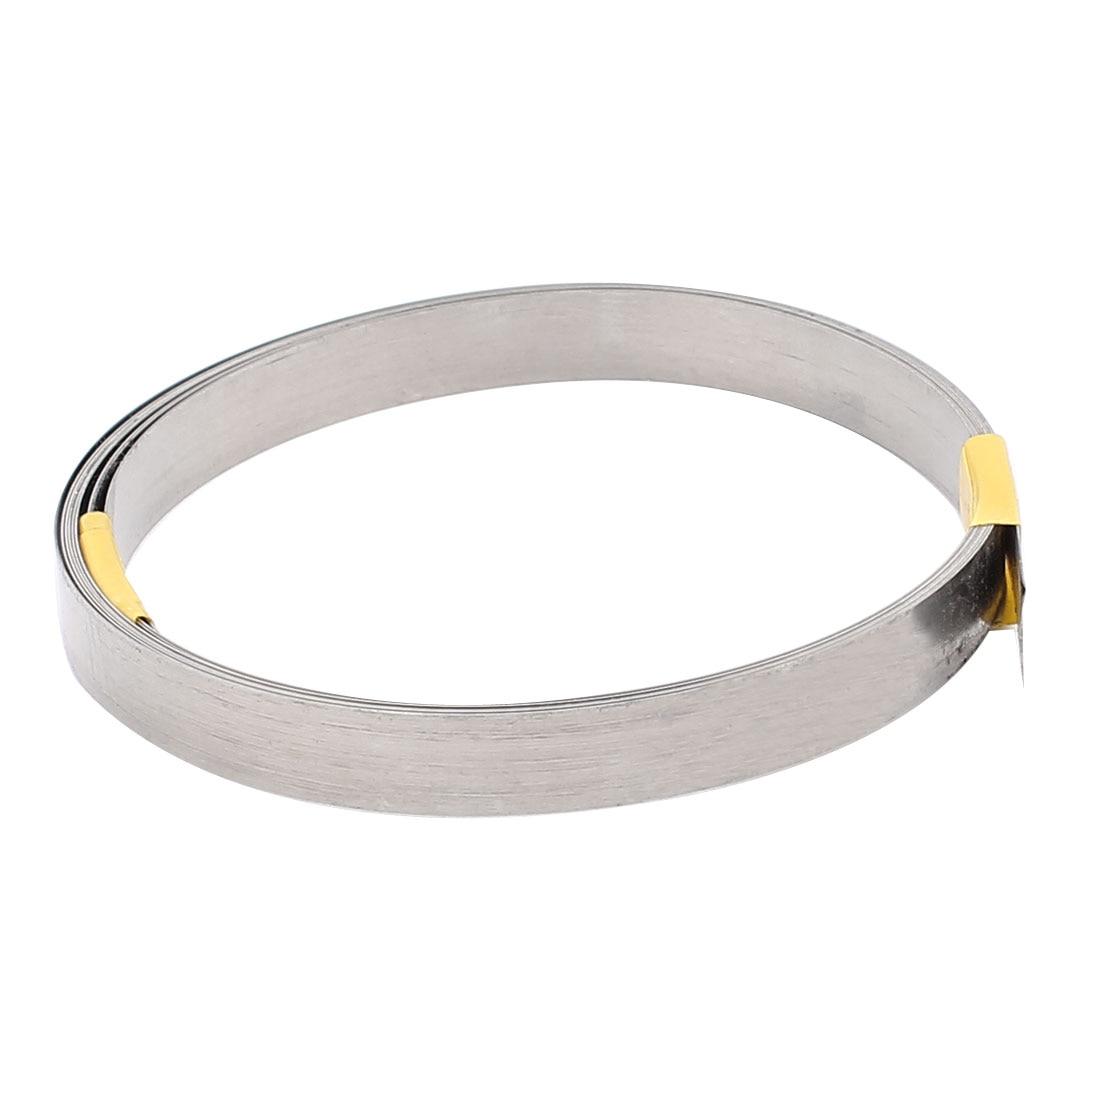 Uxcell 2M 6.6Ft 0.2X8mm Nichrome Platte Heater Wire Voor Verwarmingselementen Lengte 2M 305 Cm 3 M 5 M 750 Cm